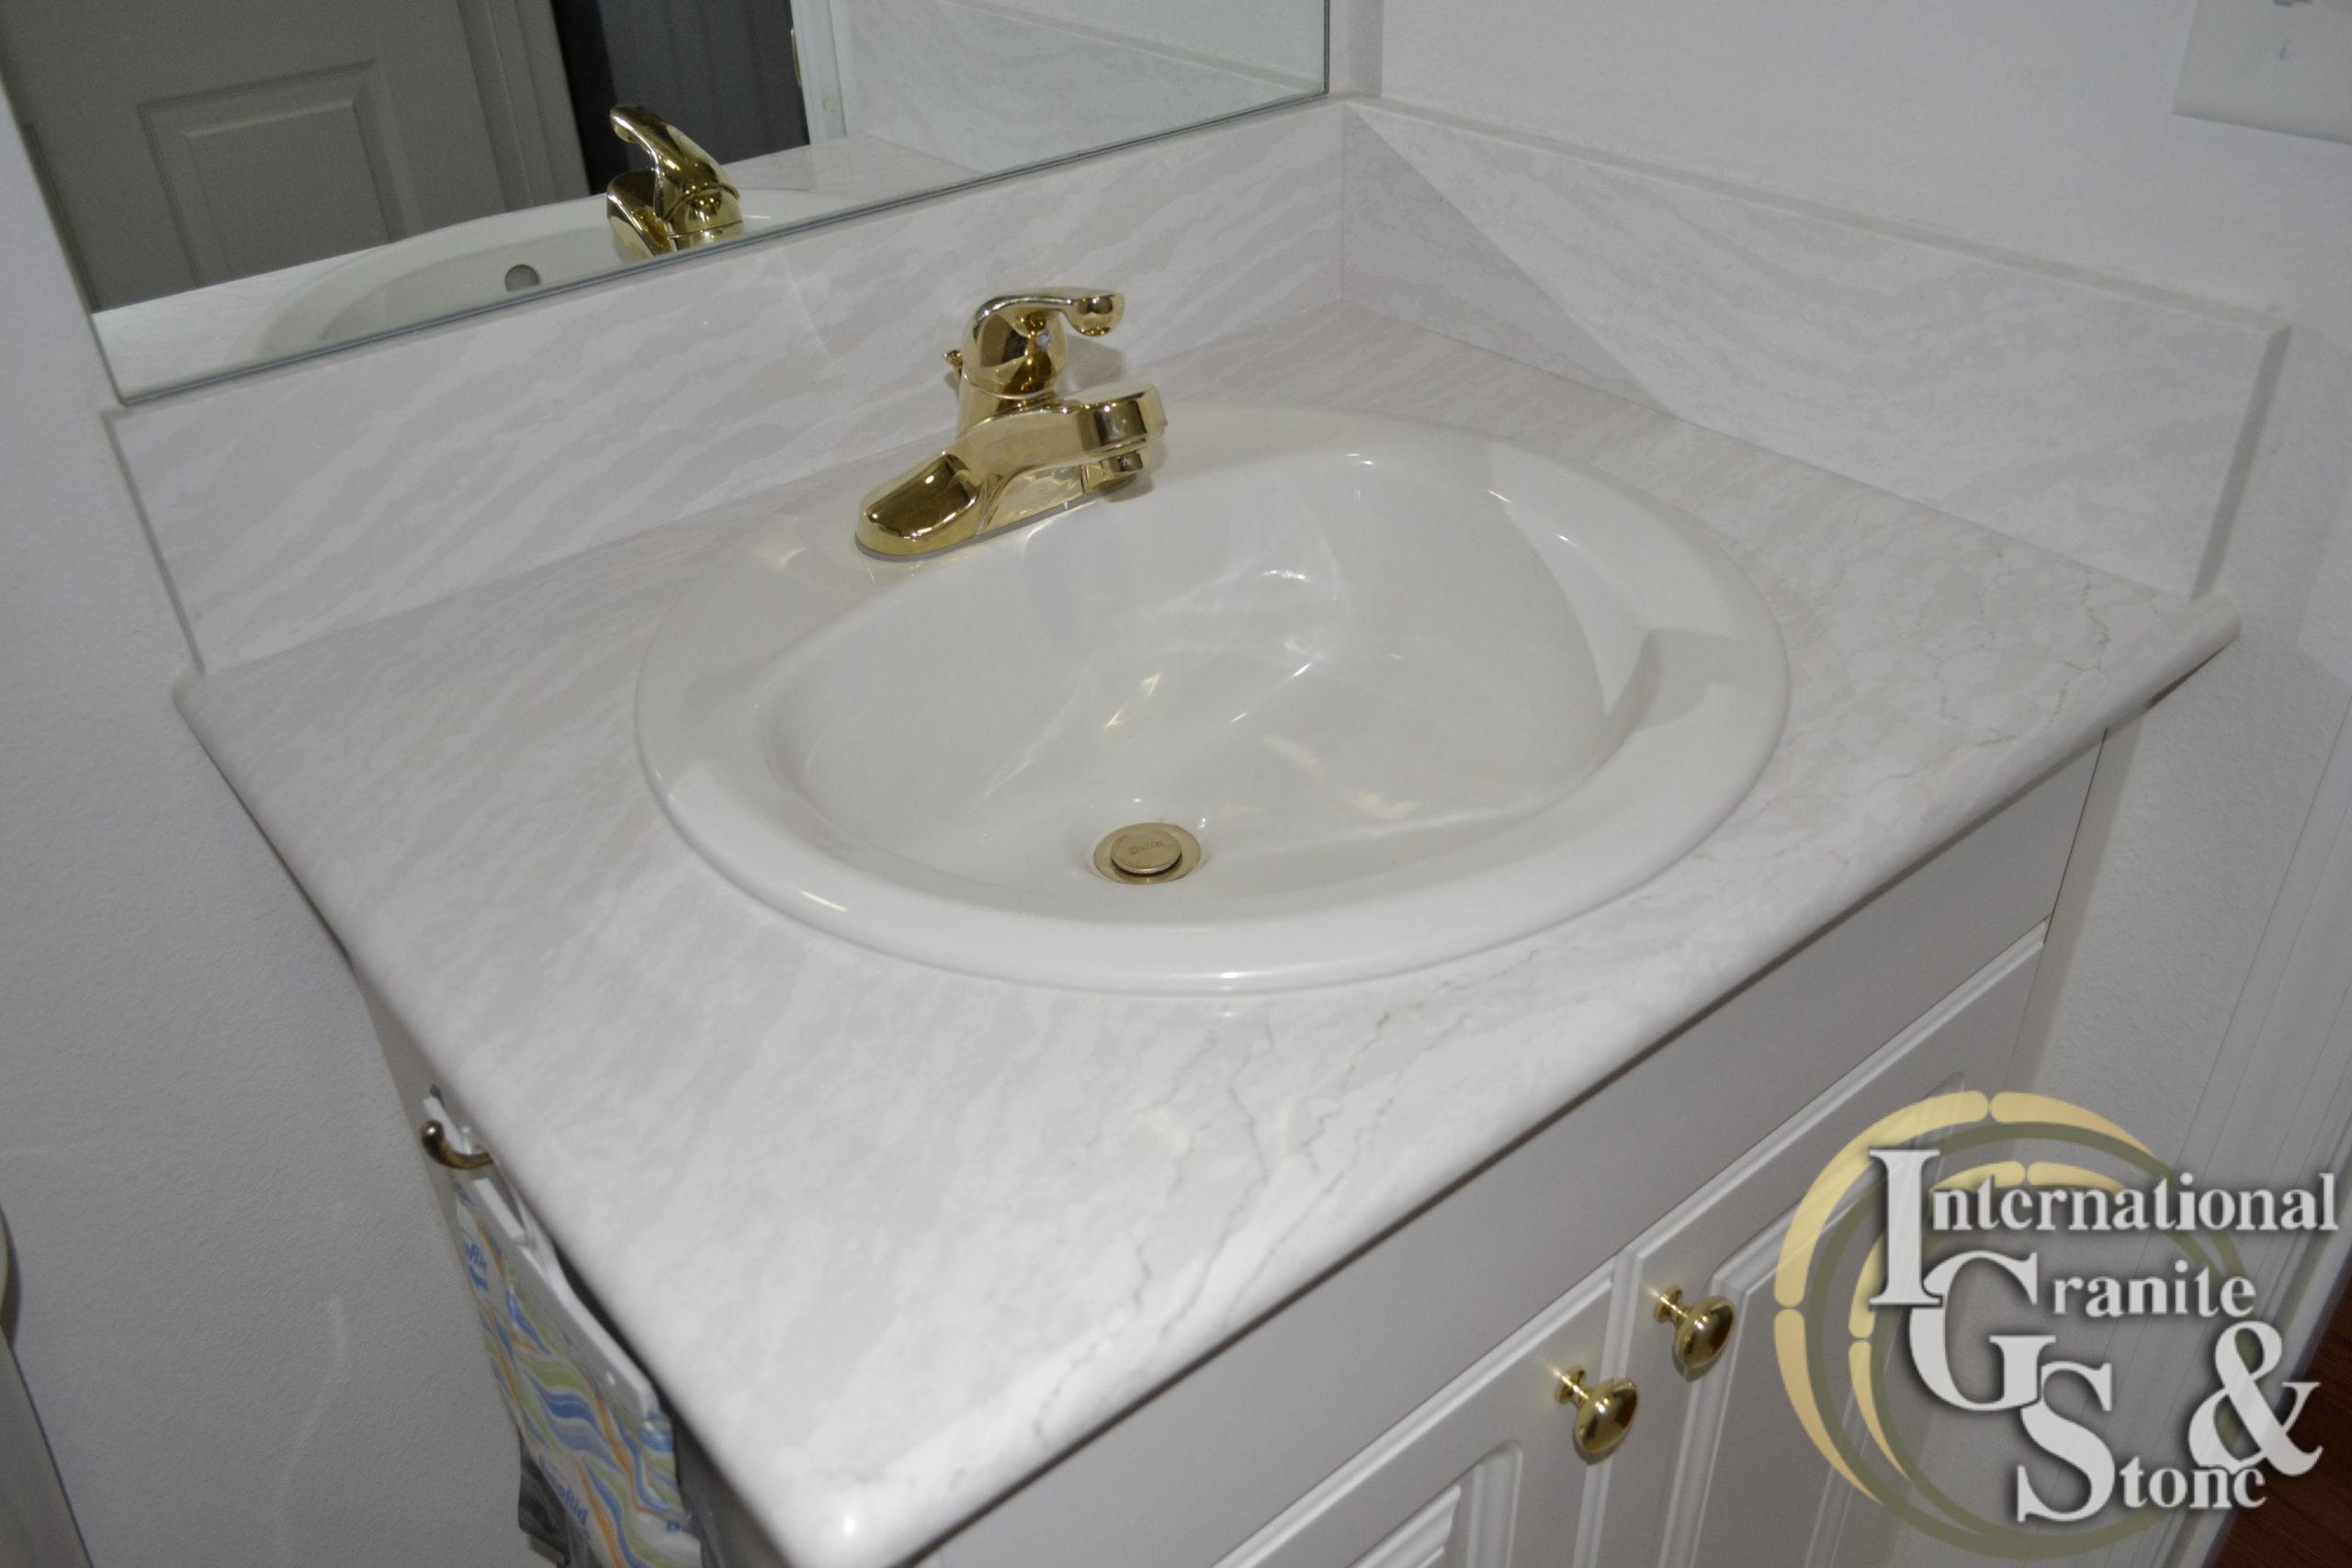 Delgatie Remnant Piece Turned into Bathroom Vanity